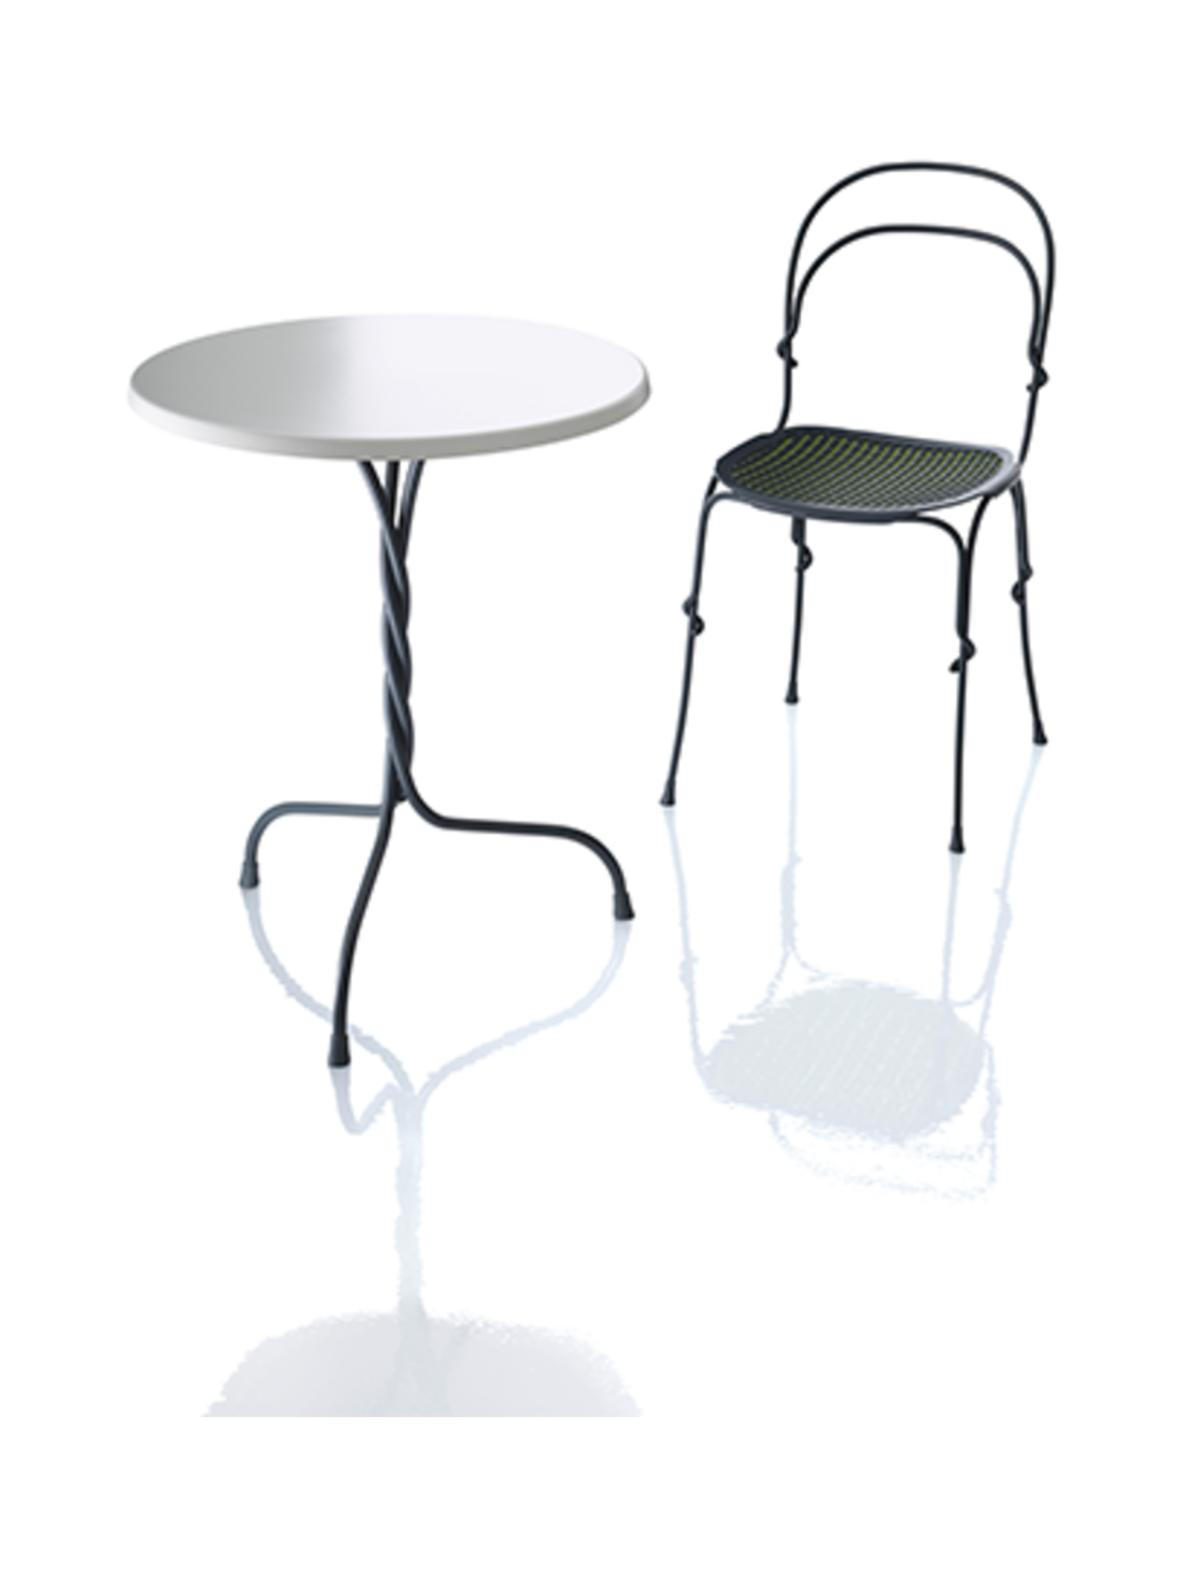 Vigna-tuoli, Magis